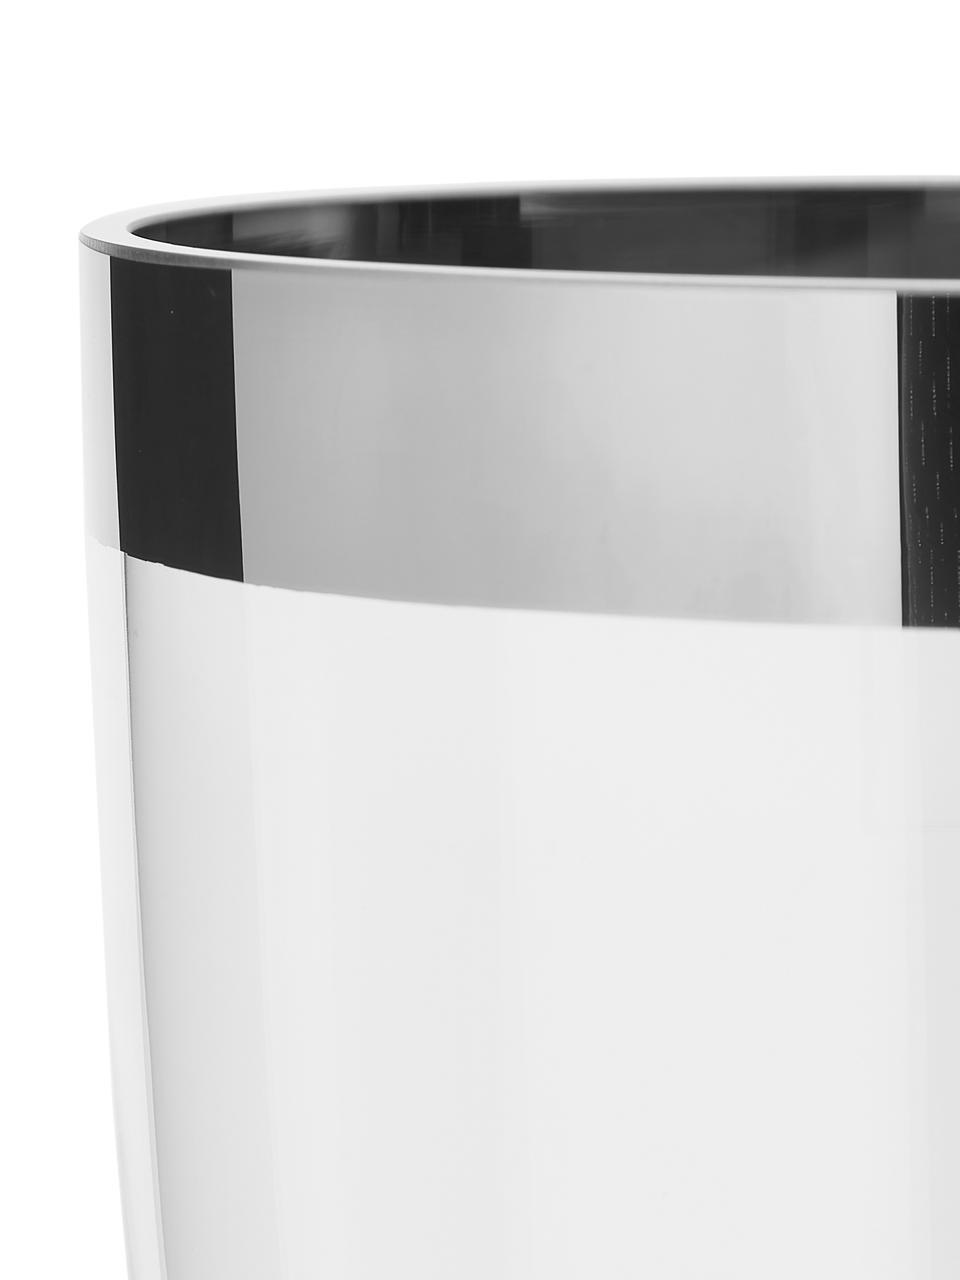 Mondgeblazen vaas Charlotte van platina glas, Platinaglas, Transparant, H 20 cm